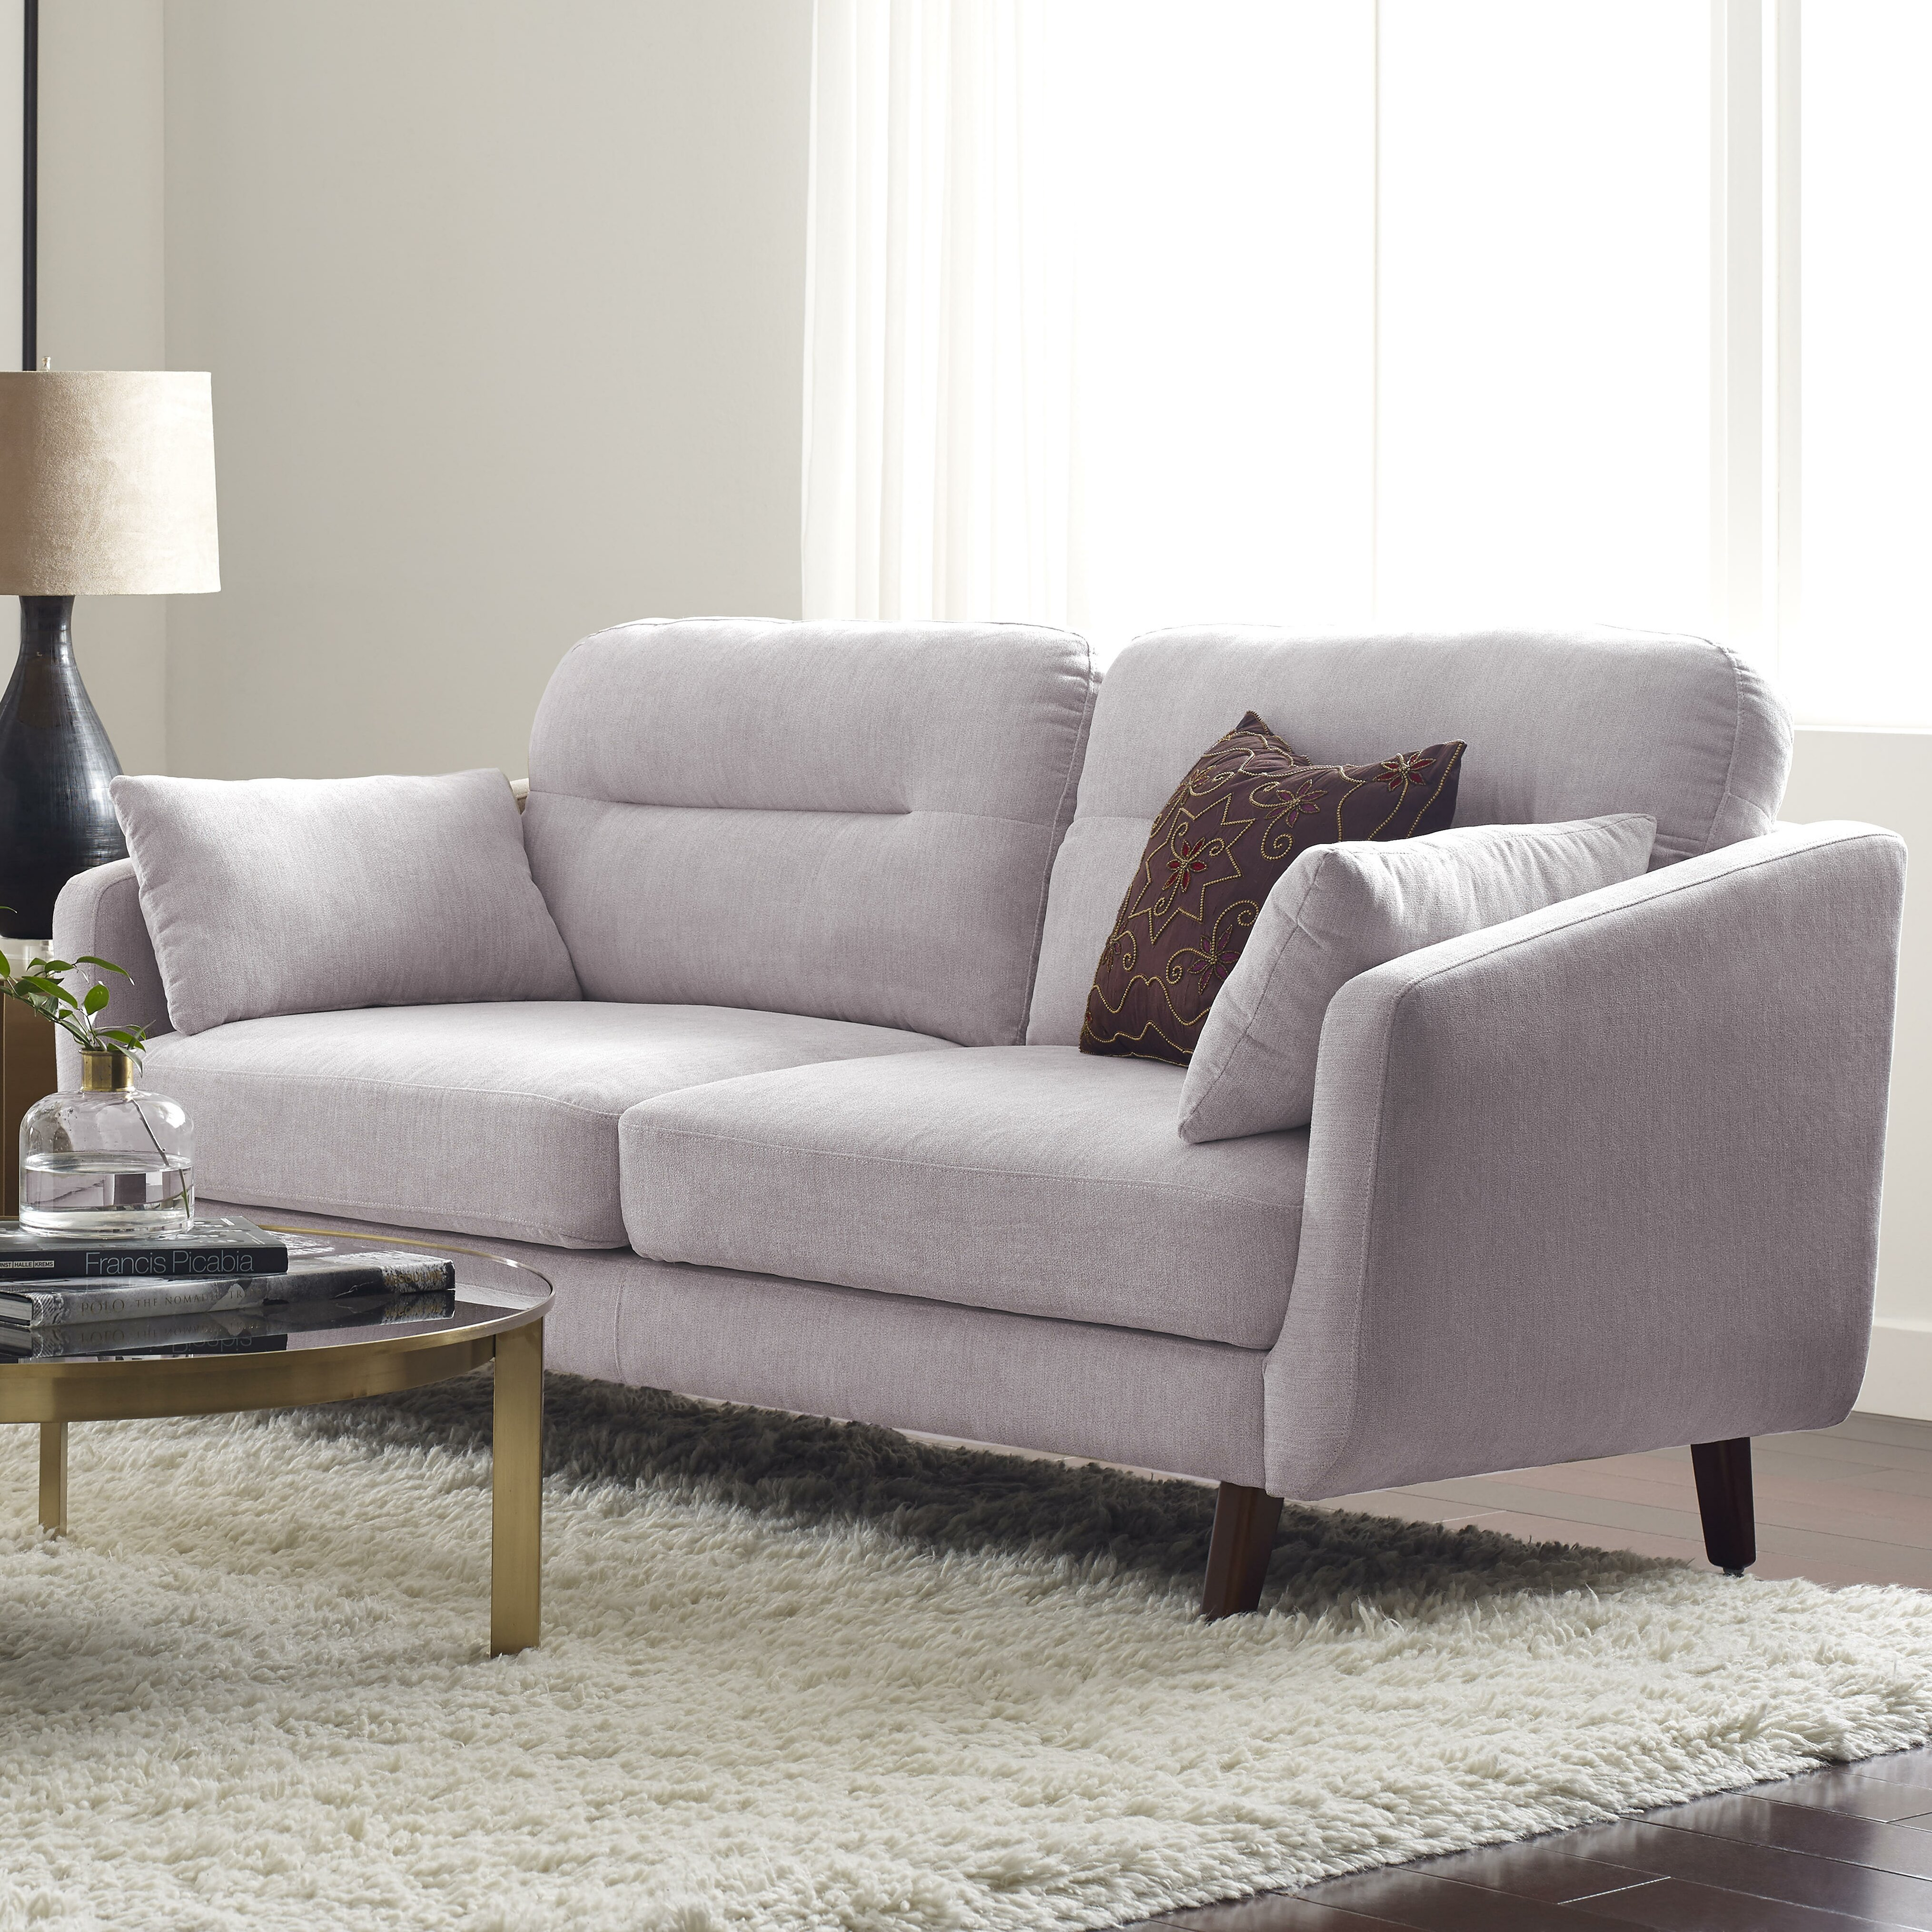 Serta Living Room Furniture Serta At Home Sierra Living Room Collection Reviews Wayfair